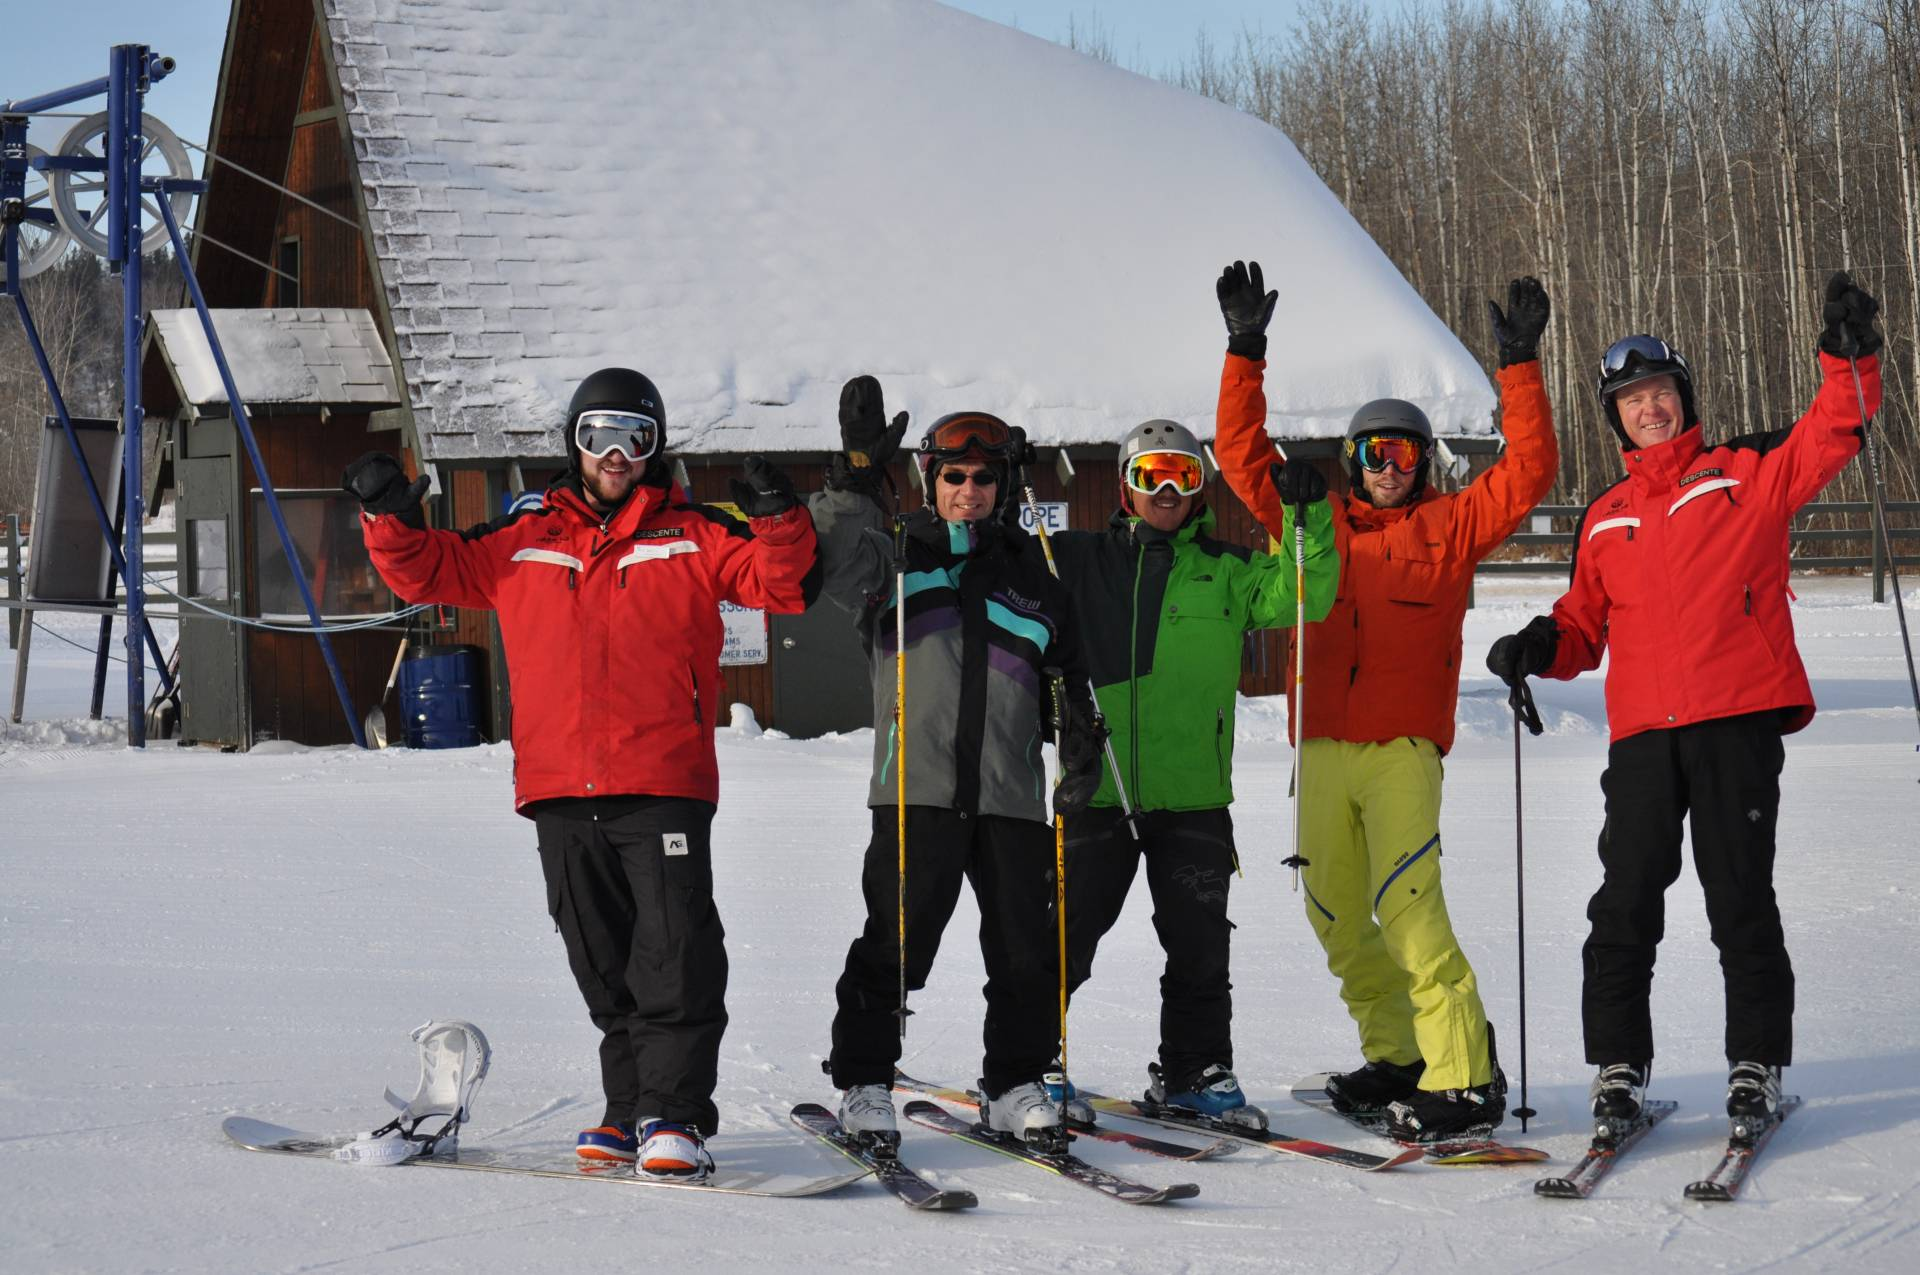 LESSON, GROUP LESSON, ski, snowboard, rabbit hill, edmonton, winter sport, saturday, sunday